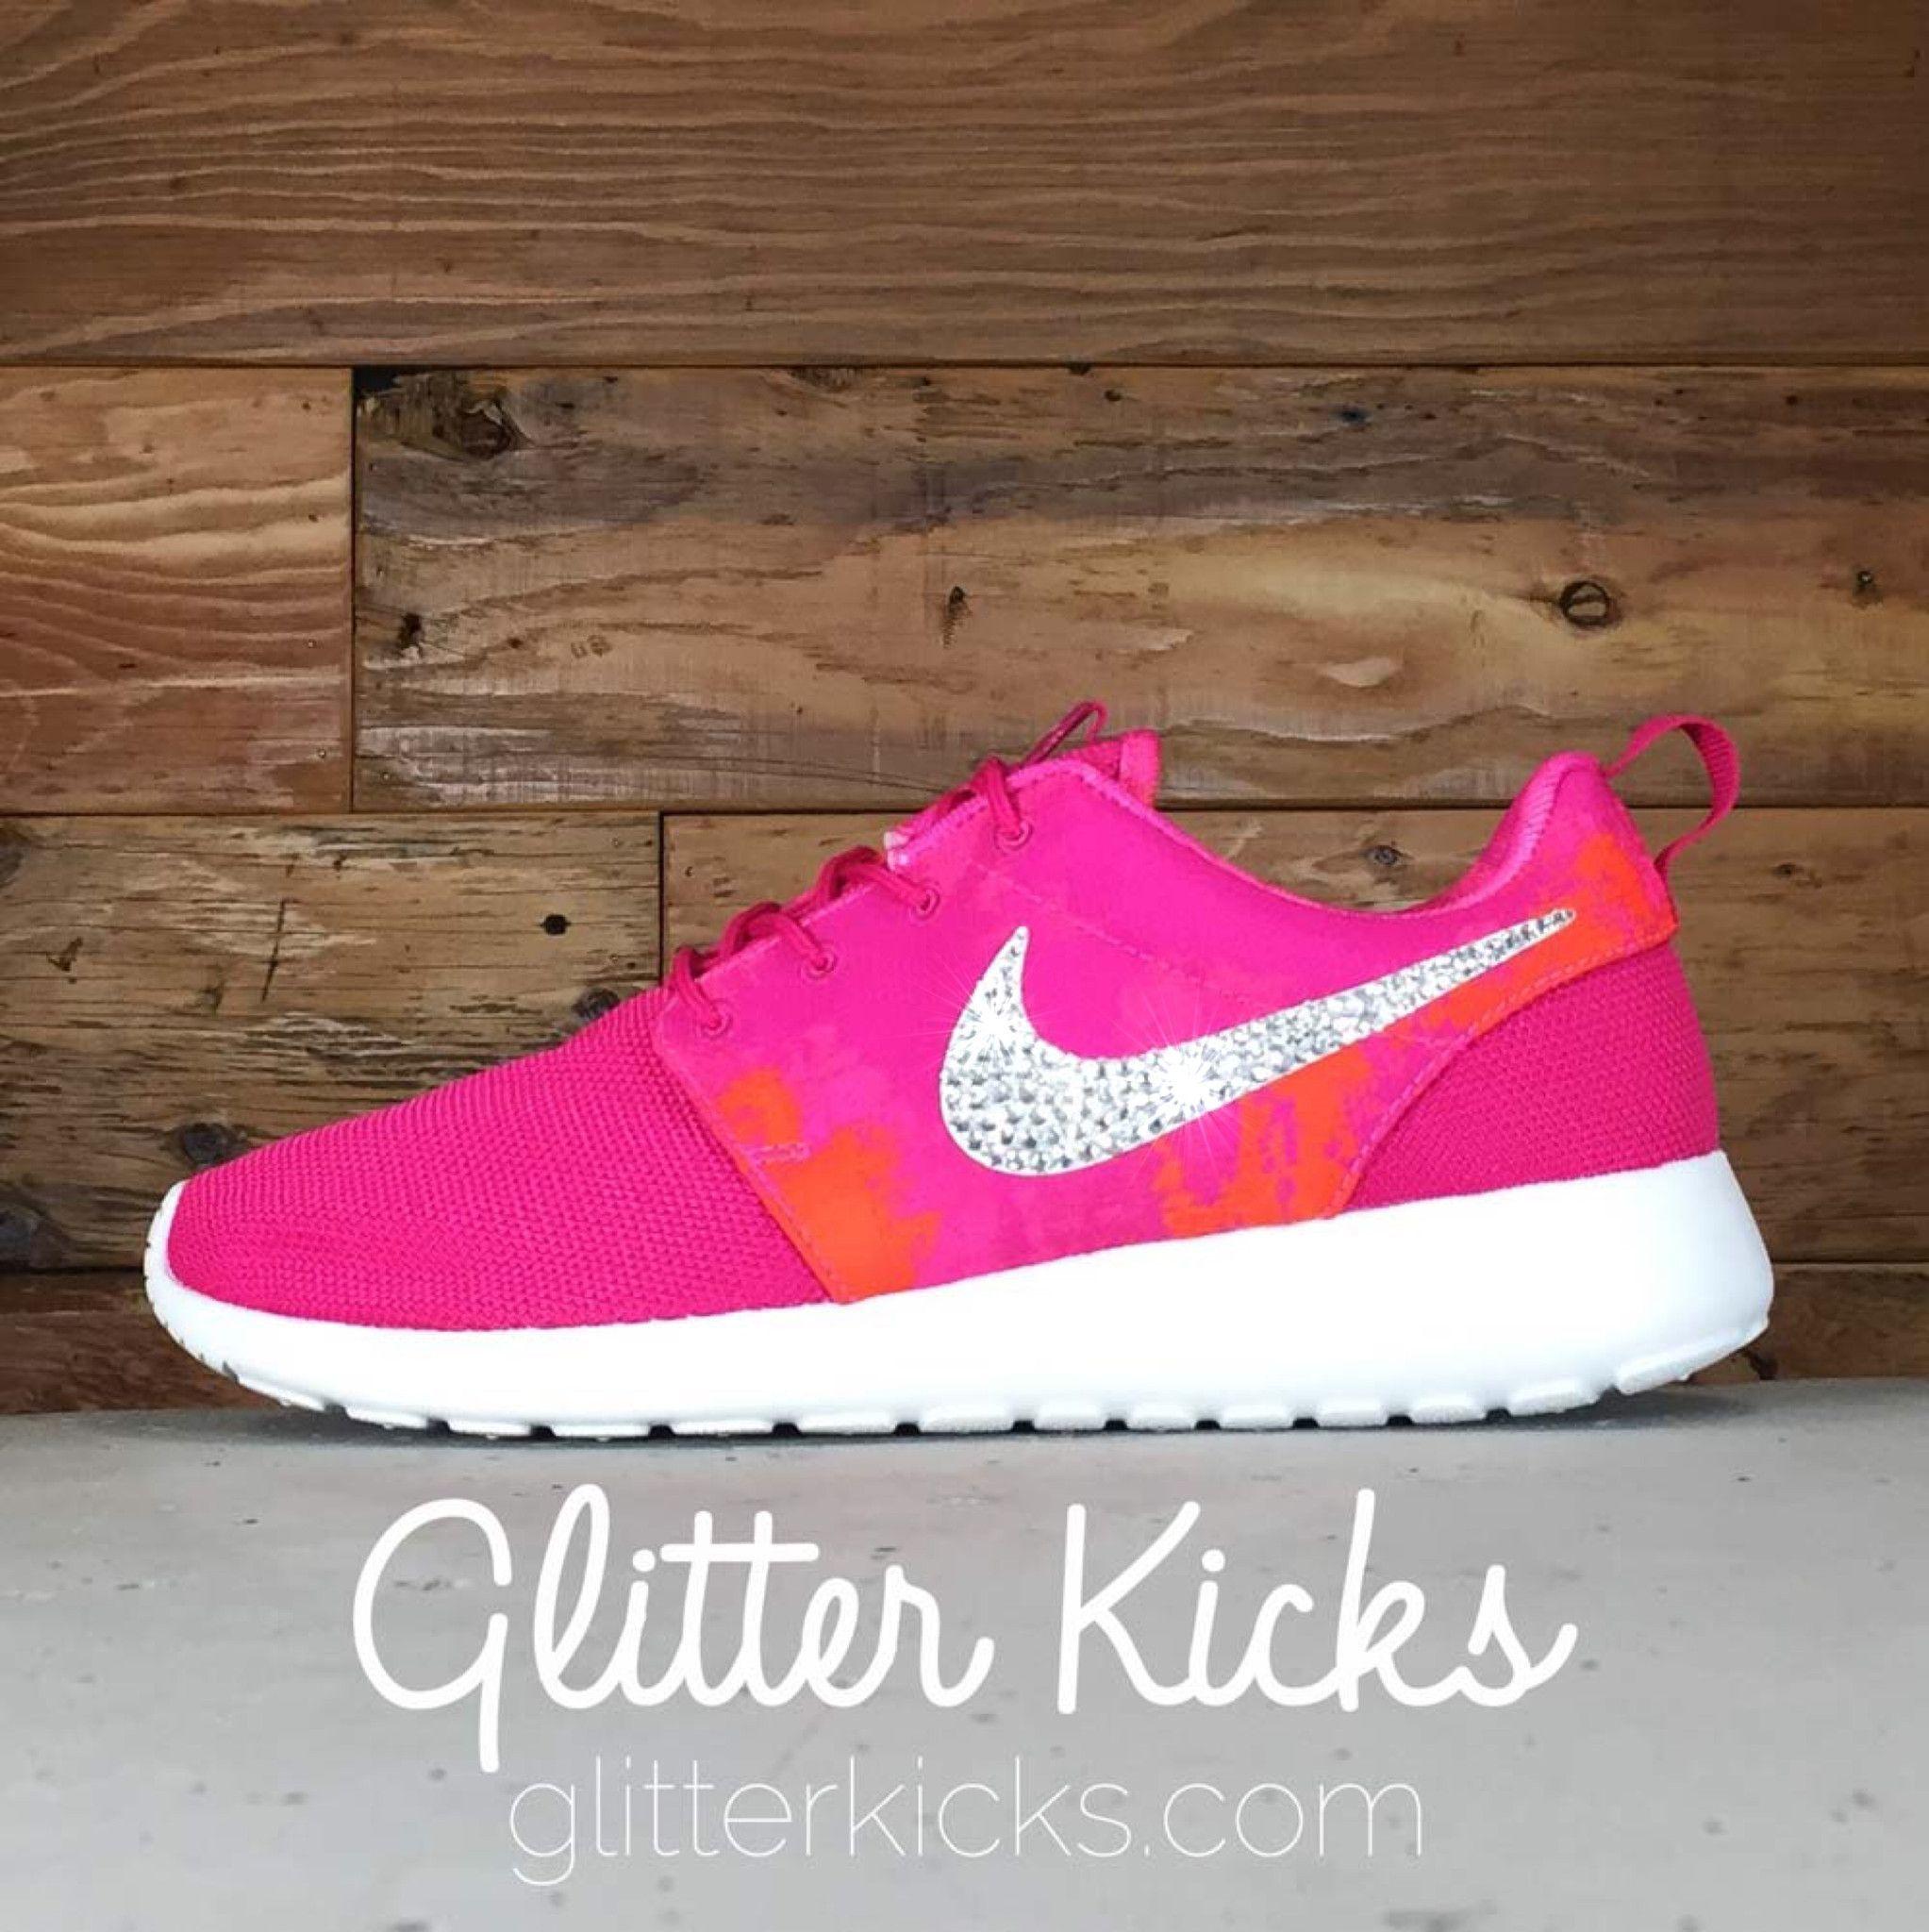 Bling shoes · Women's Nike Roshe One Print By Glitter Kicks - Customized  With Swarovski Crystal Rhinestones - Fuschia